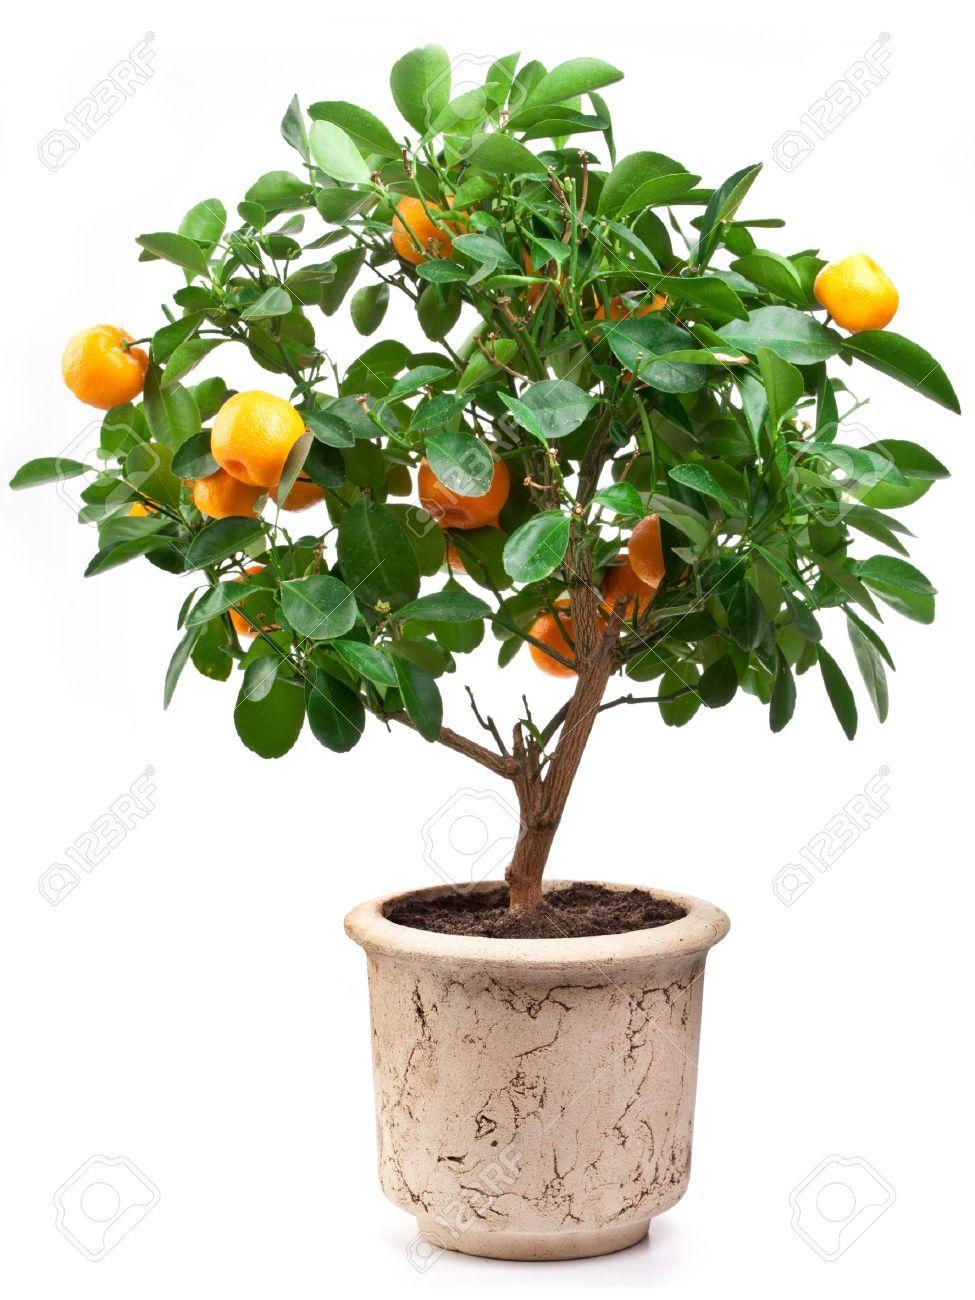 9737692-Small-tangerines-tree-on-white-background--Stock-Photo-tree-lemon-orange.jpg 975×1,300 pixels